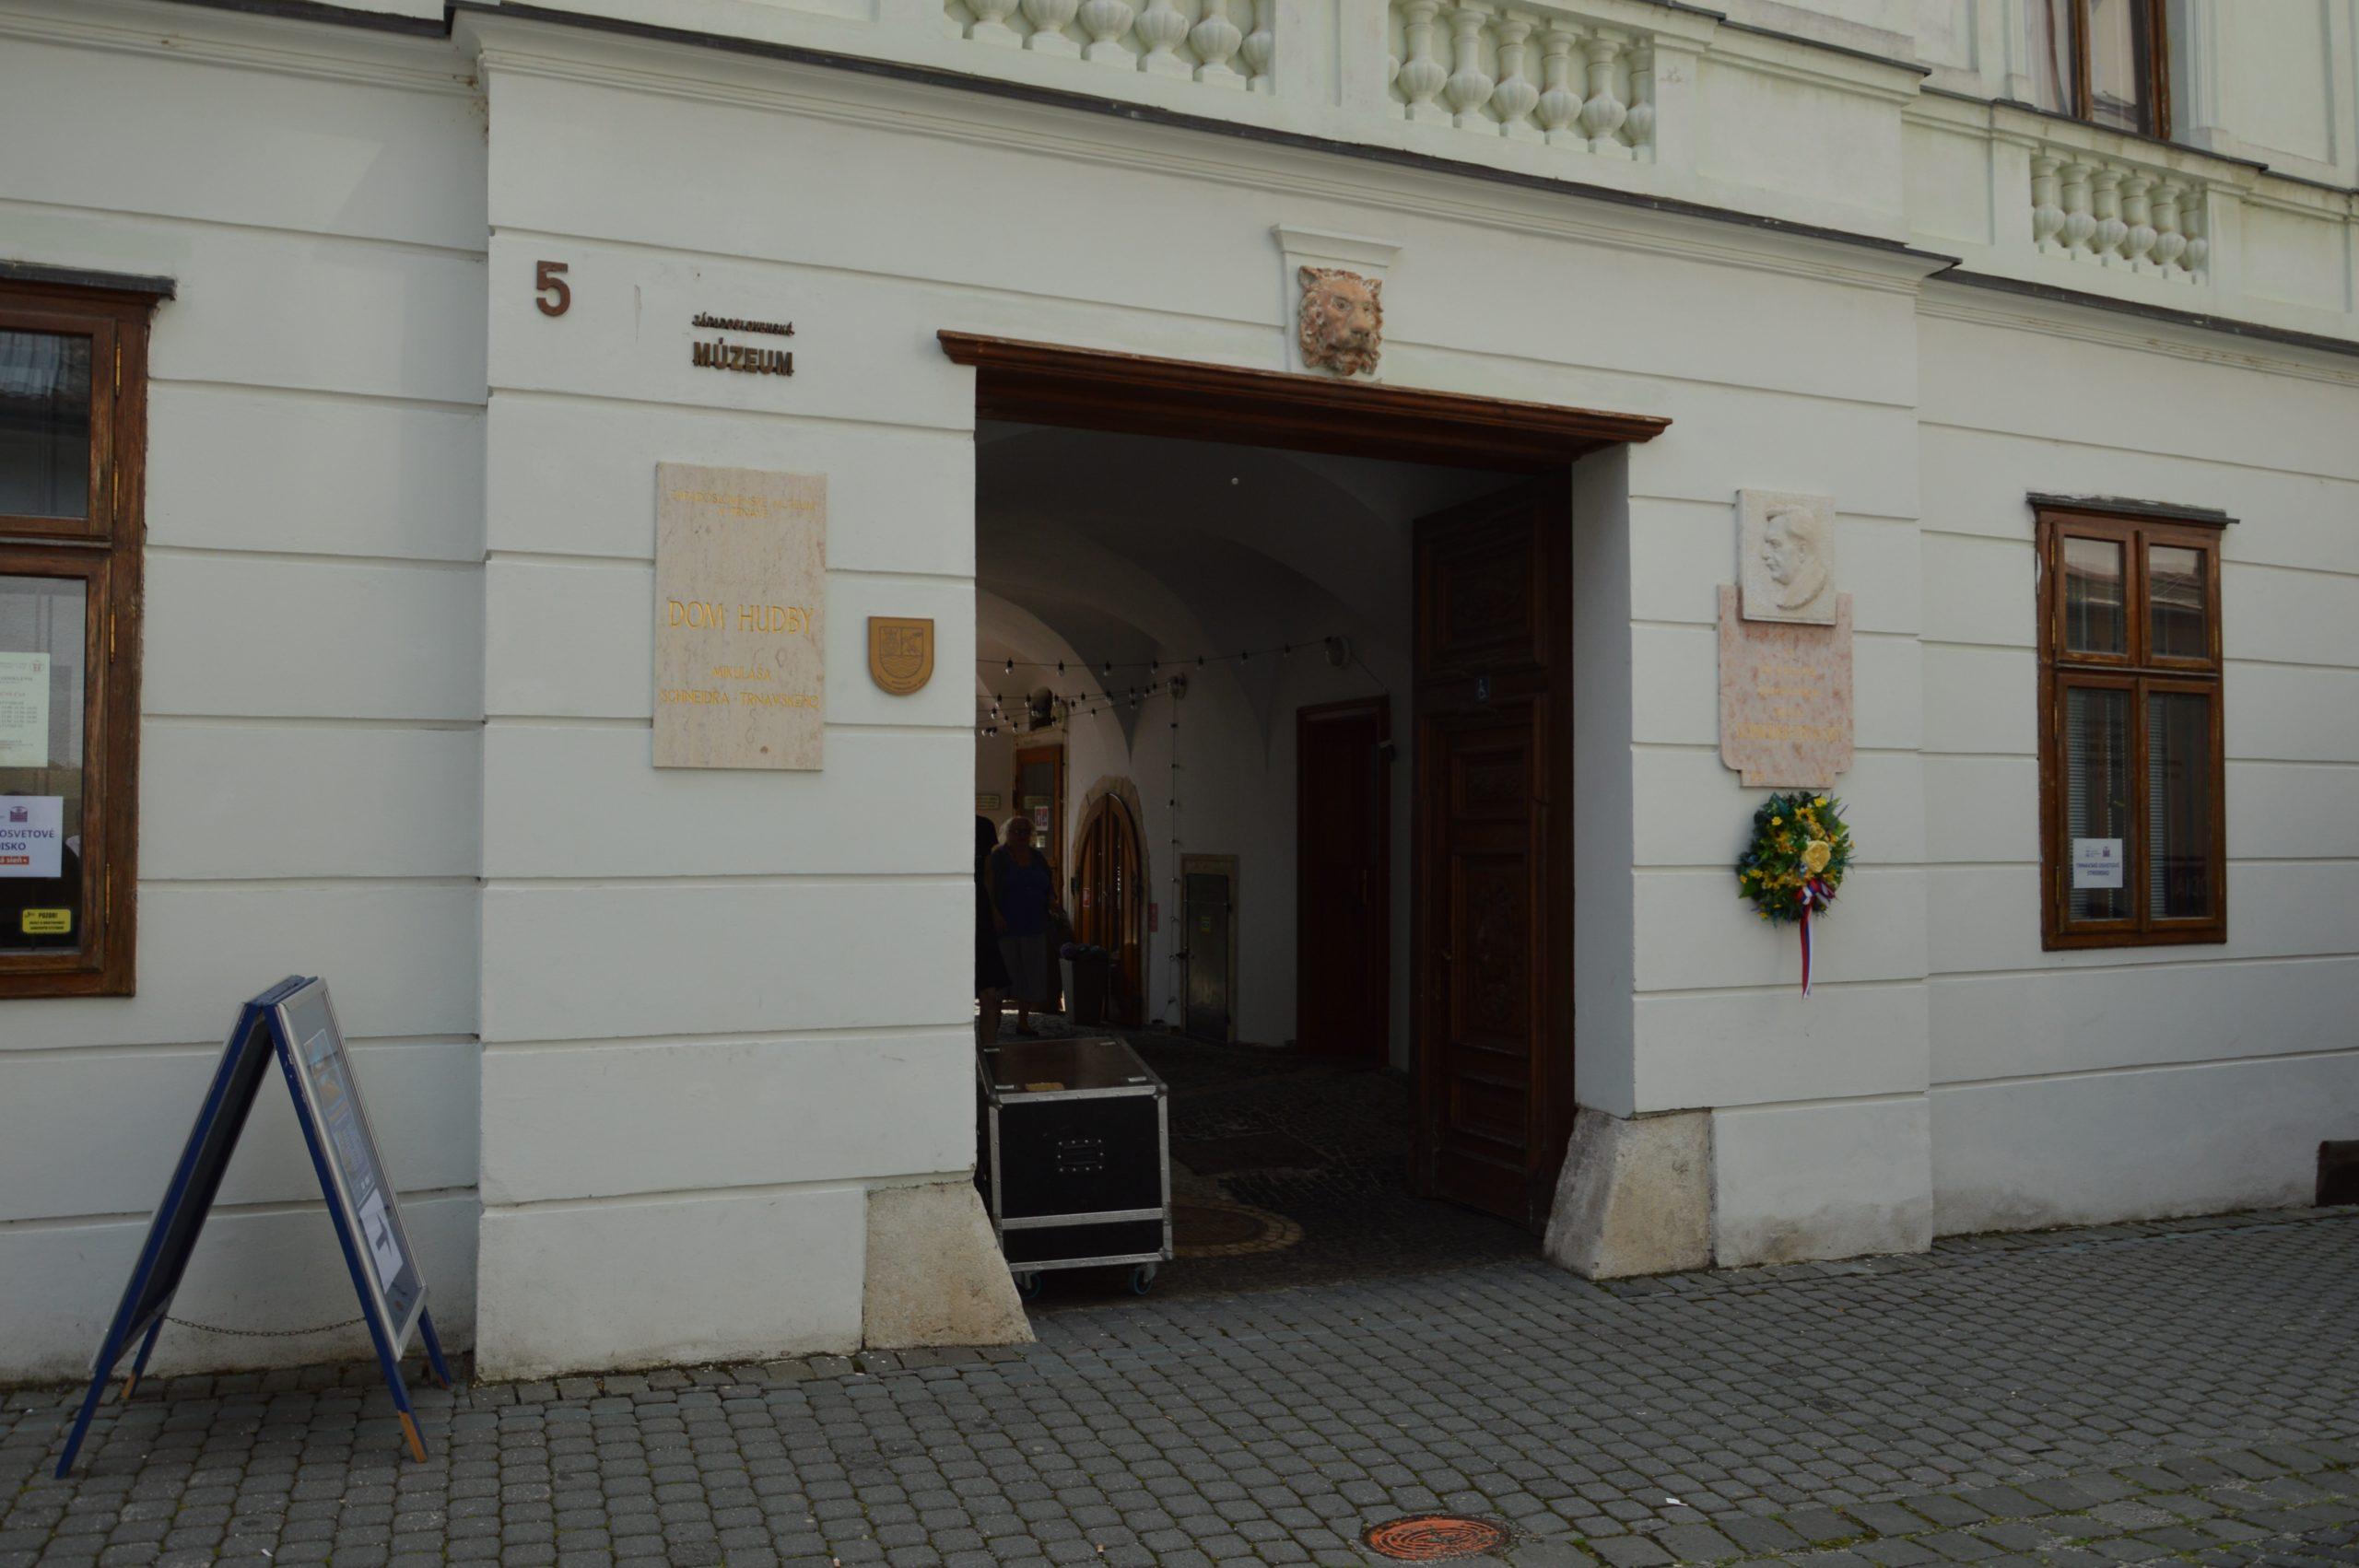 Vchod do Domu hudby v Trnave.